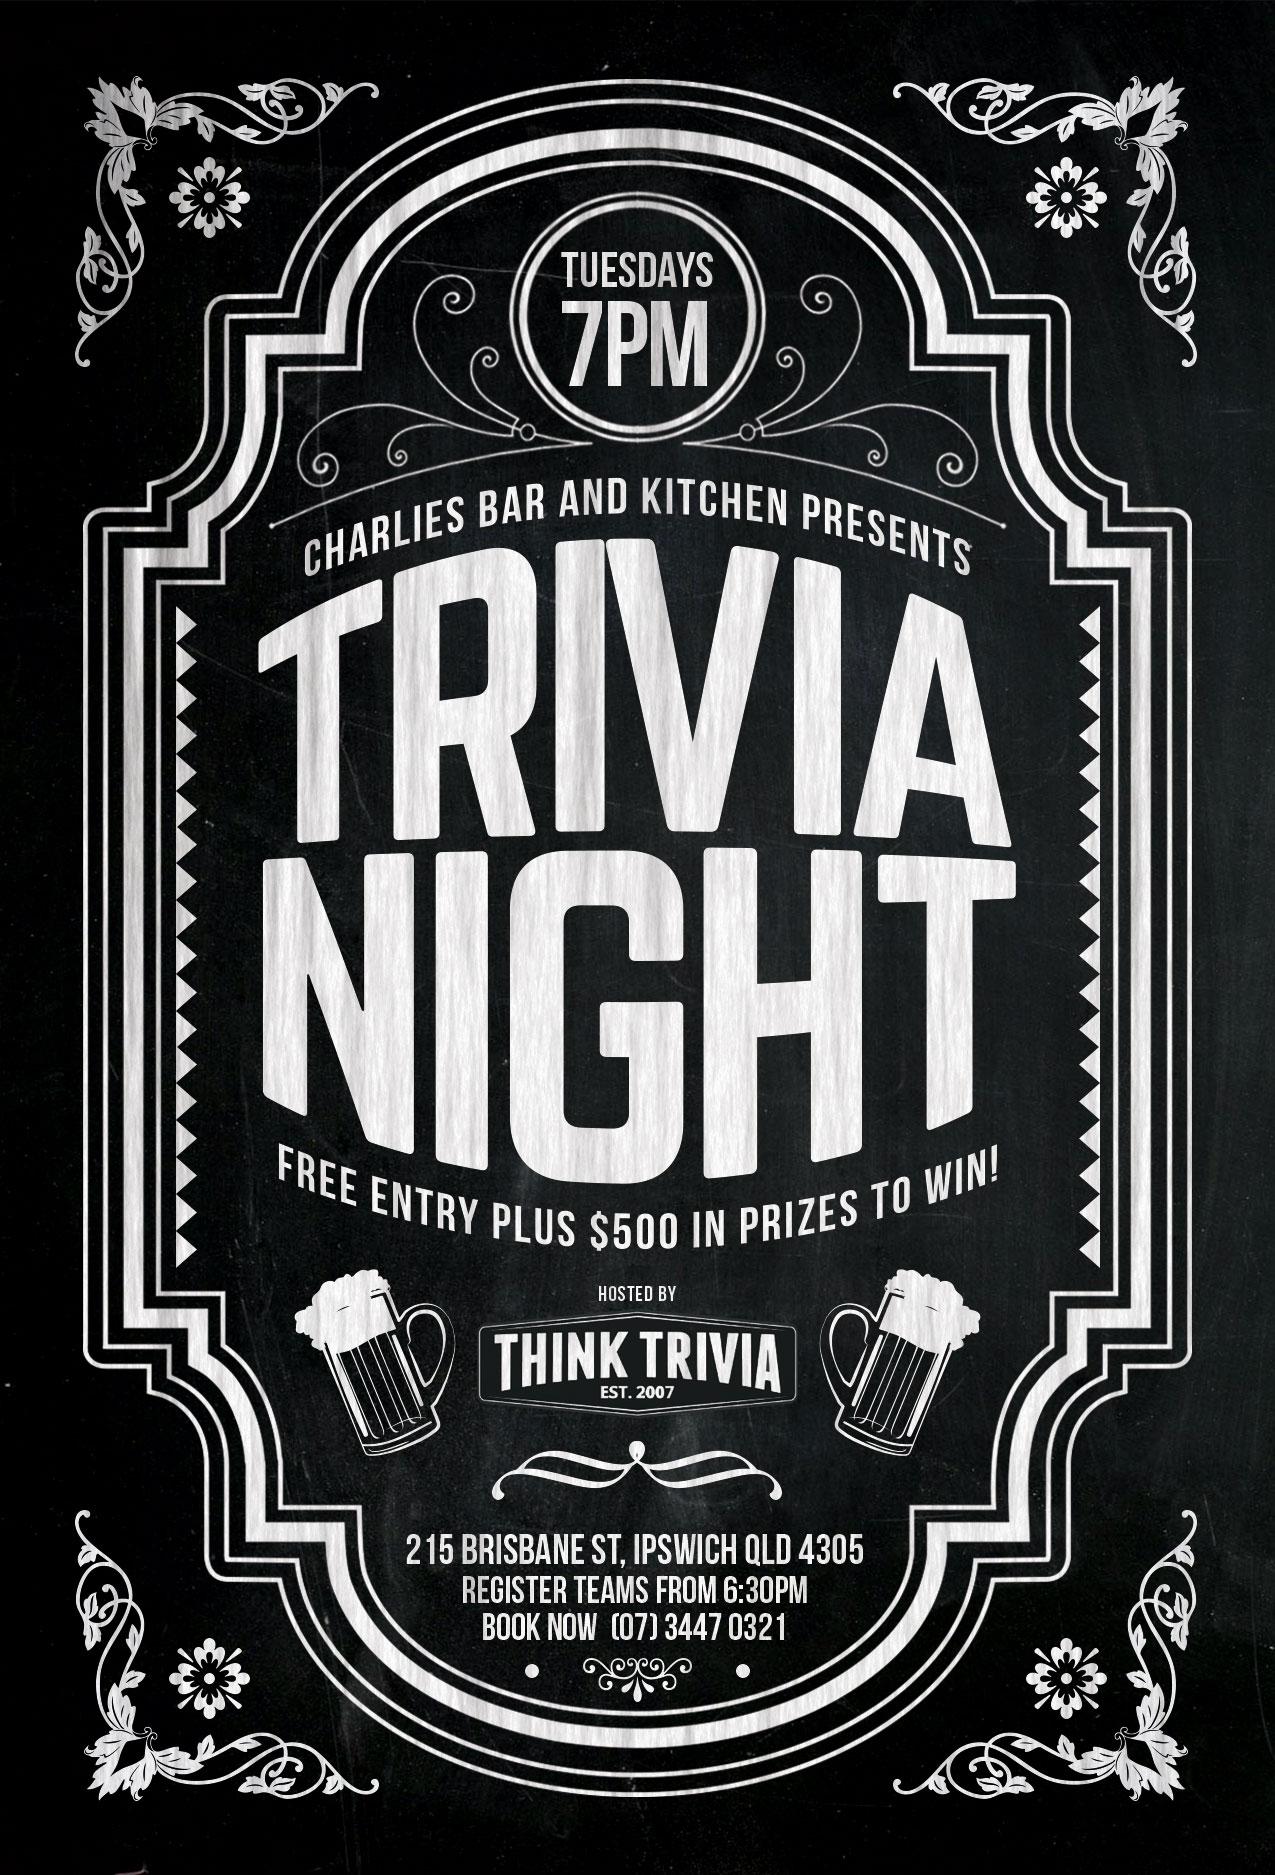 Ipswich Trivia - Tuesday - 7pm @ Charlies Bar & Kitchen